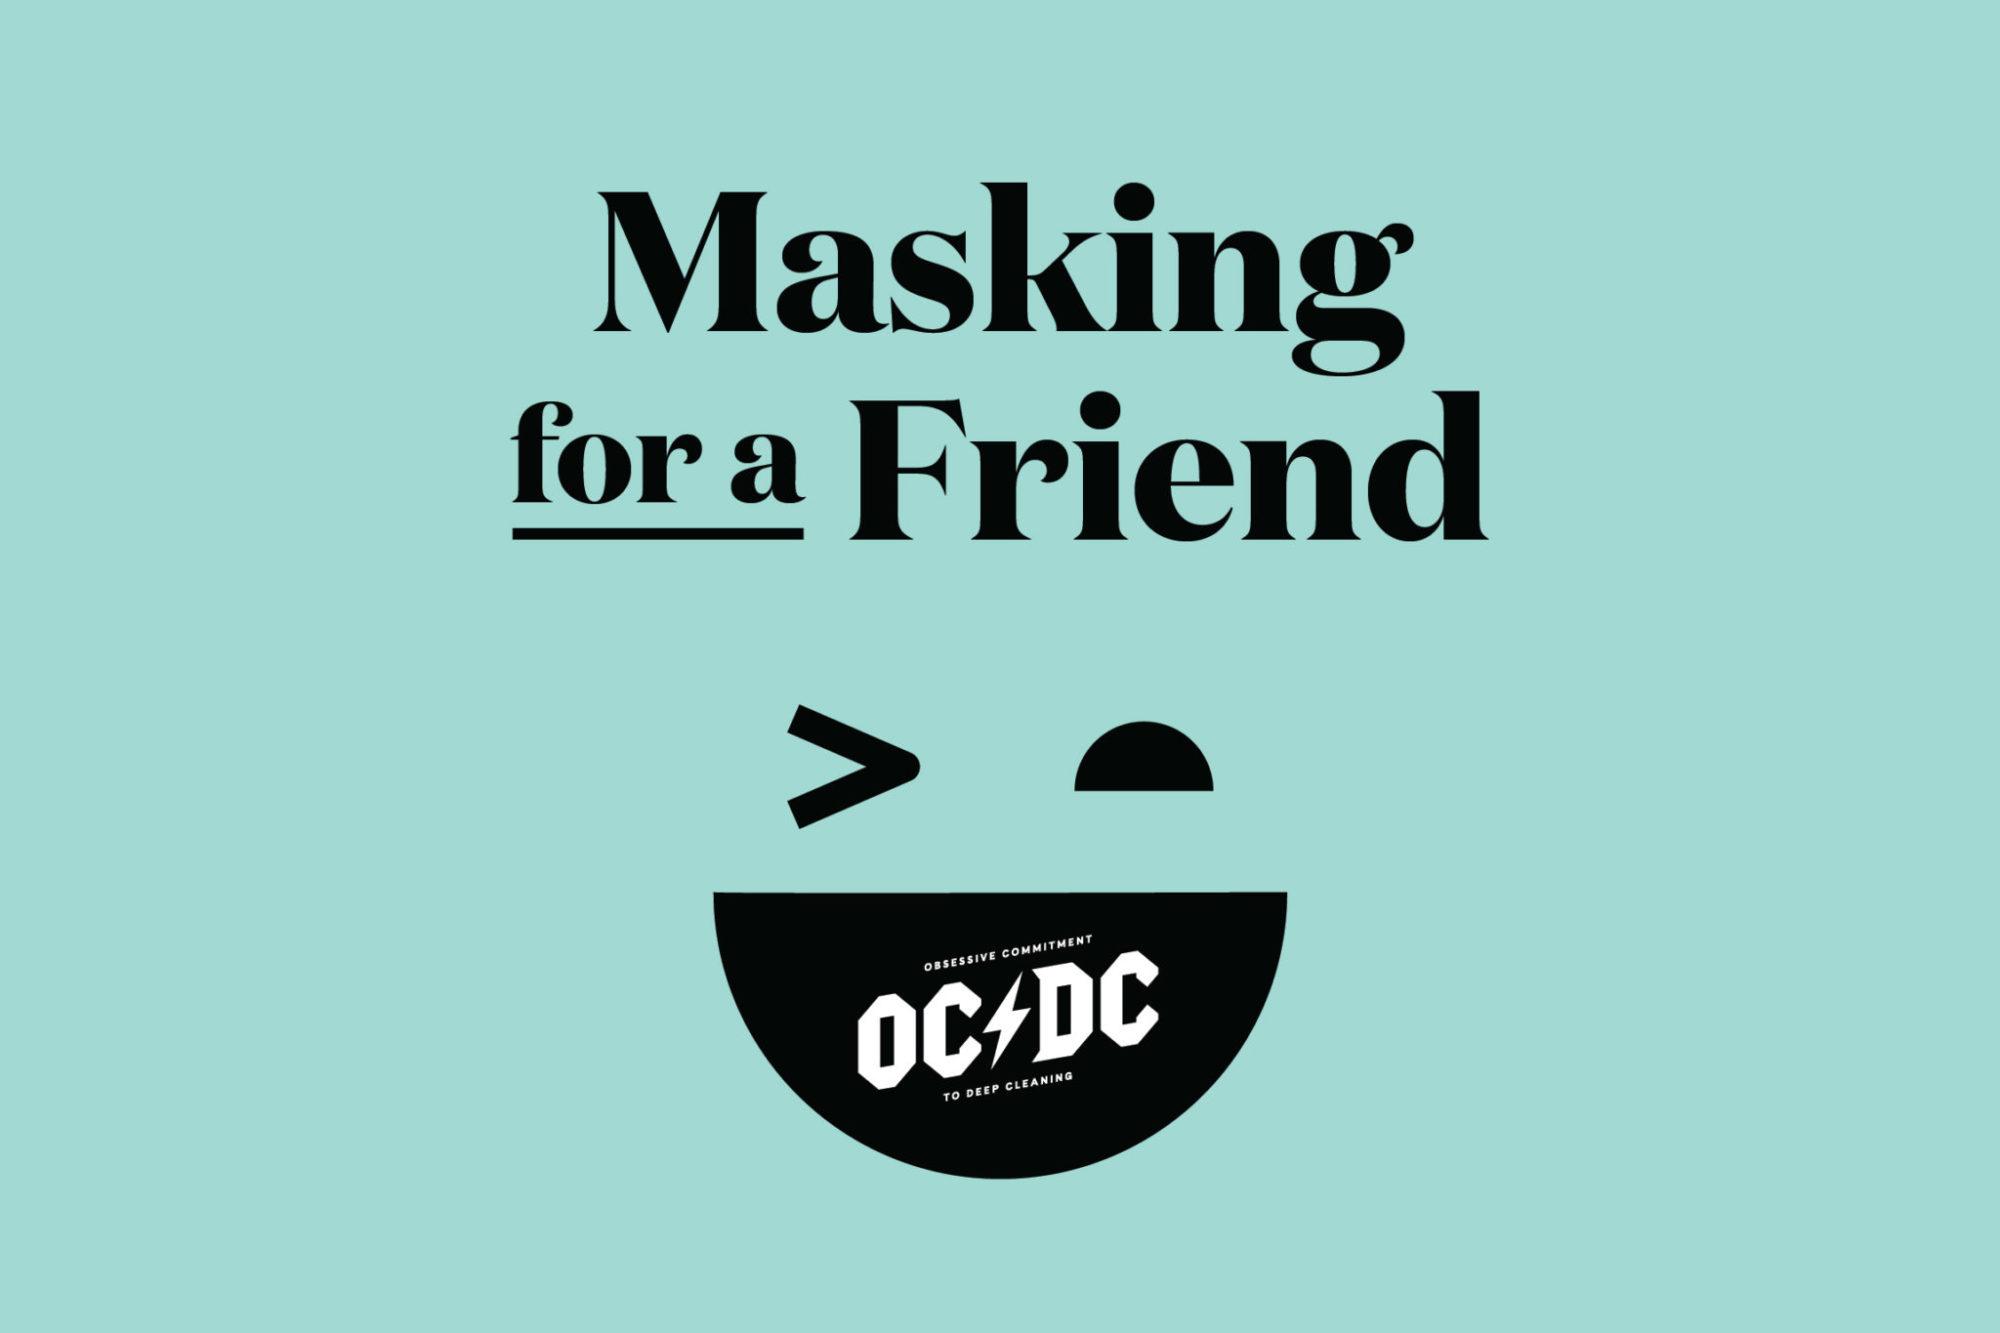 OCDC Mask Announcement